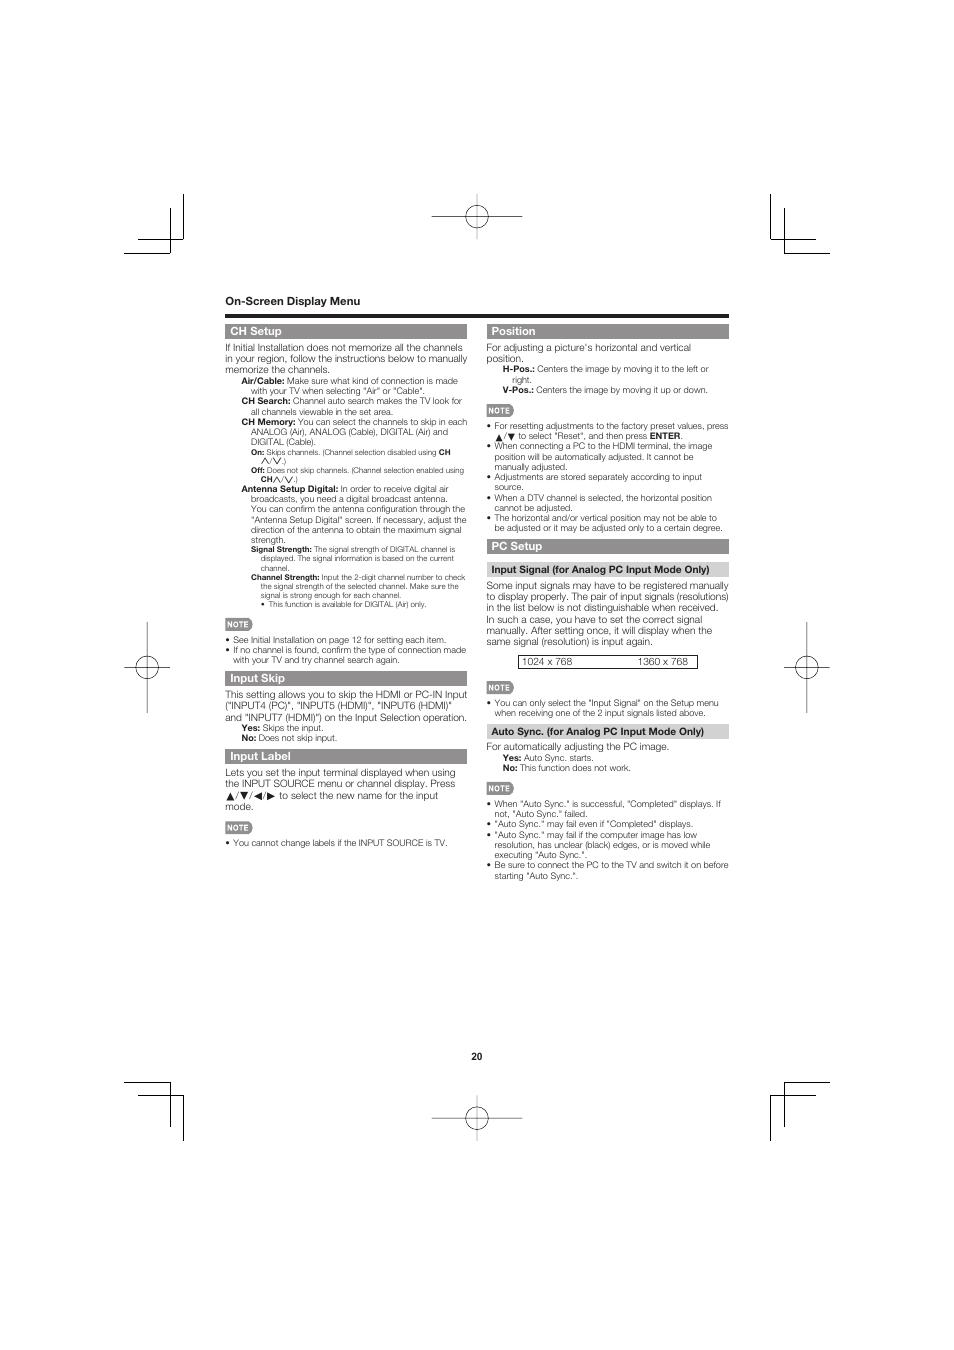 Ch setup, Input skip, Input label | Sharp AQUOS LC-40D68UT